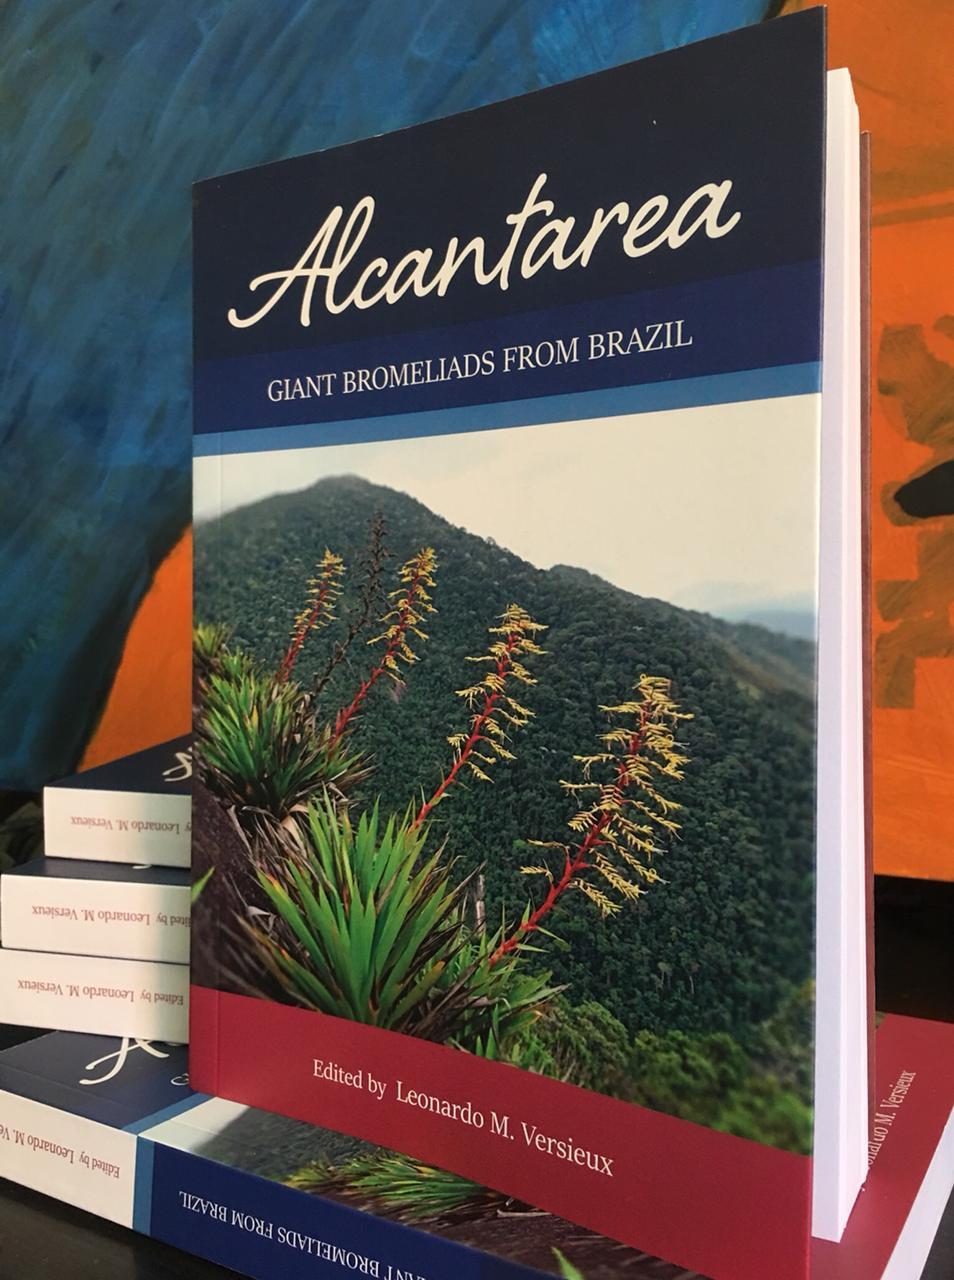 Alcantarea Giant Bromeliads from Brazil